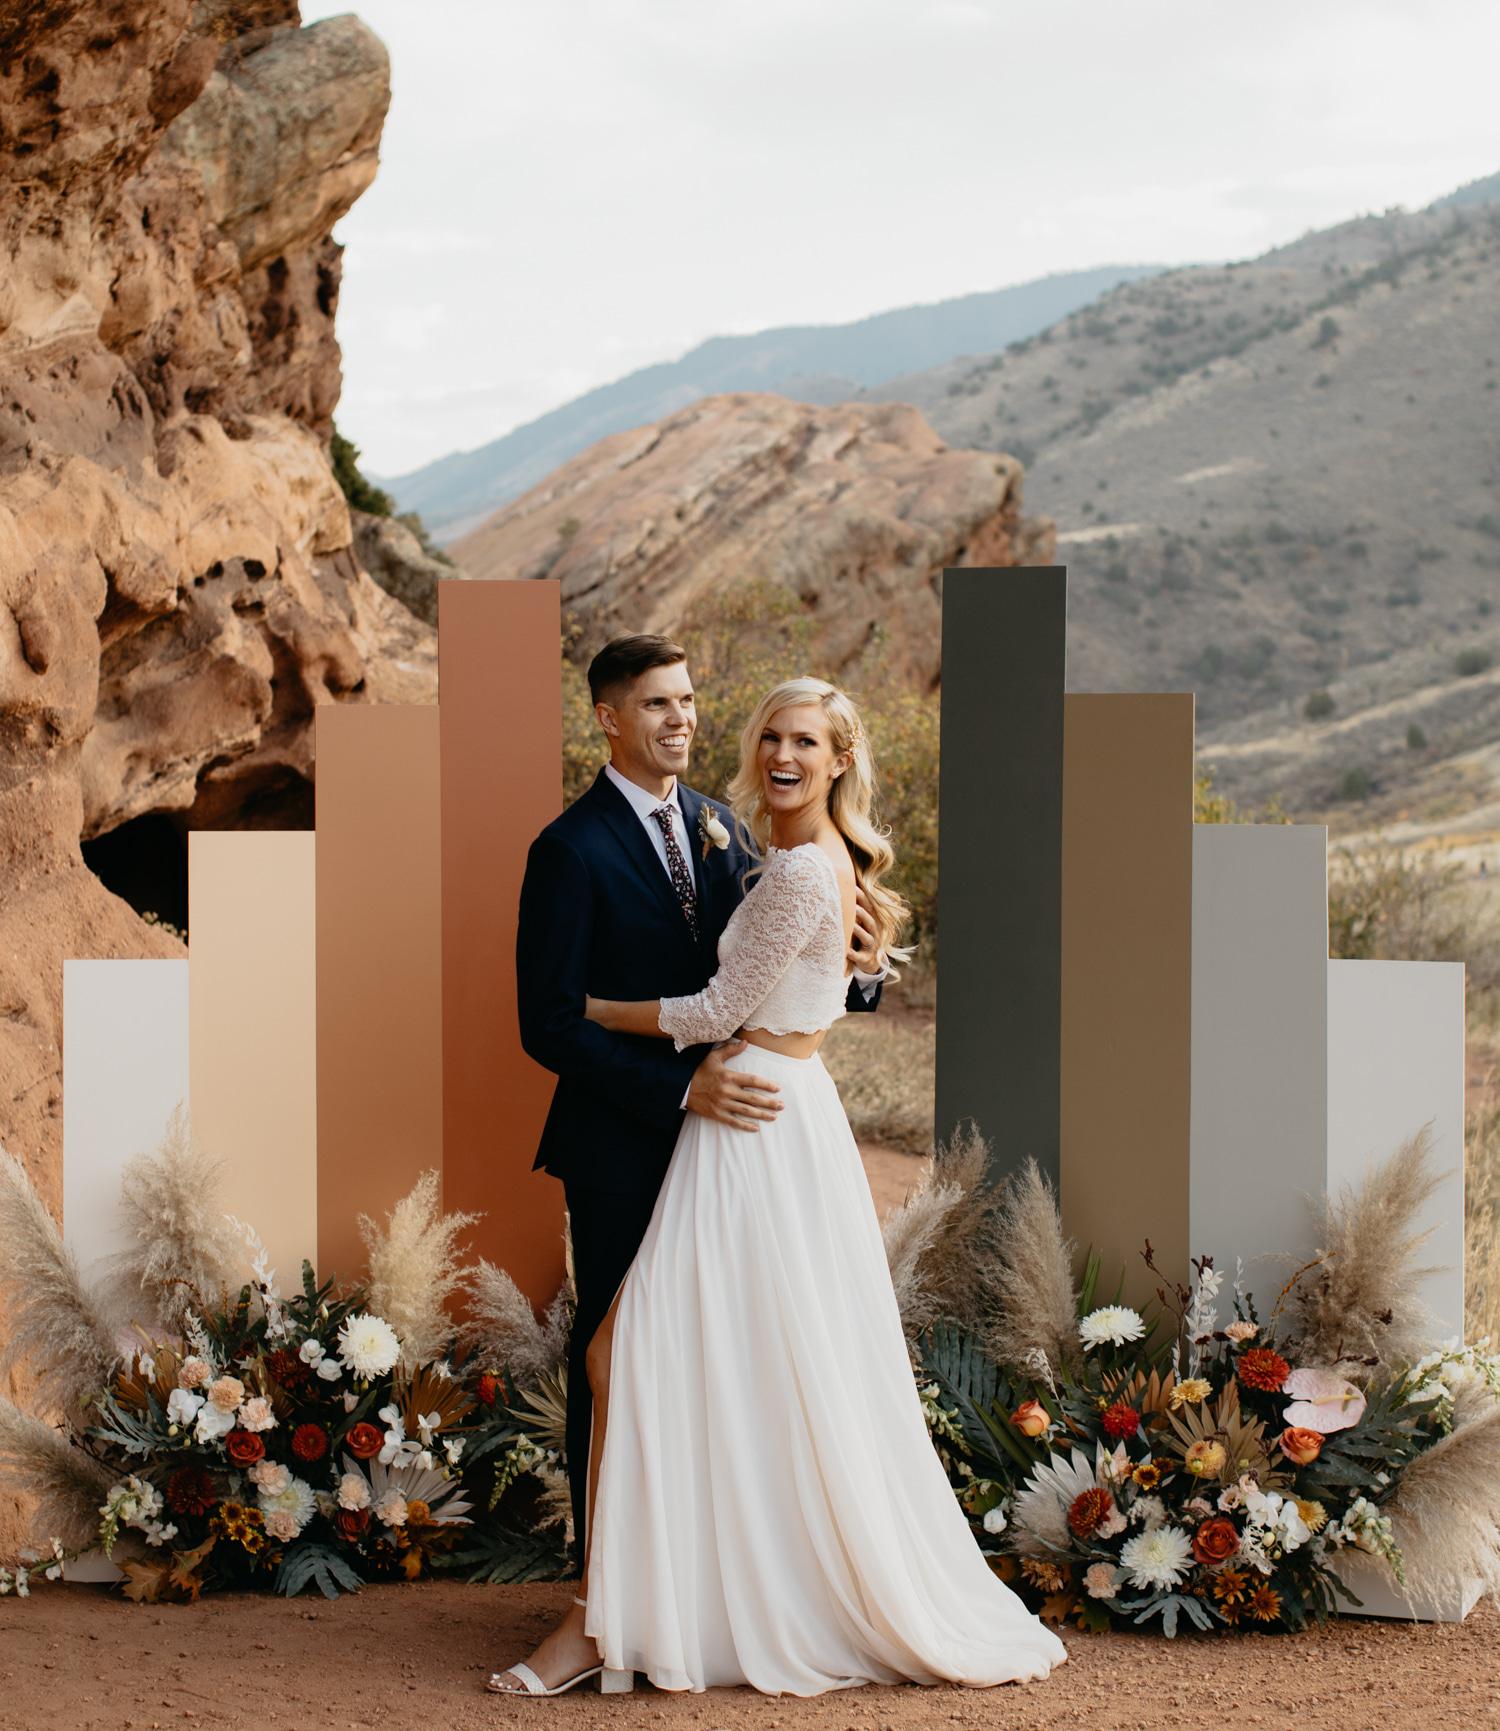 micro wedding ideas